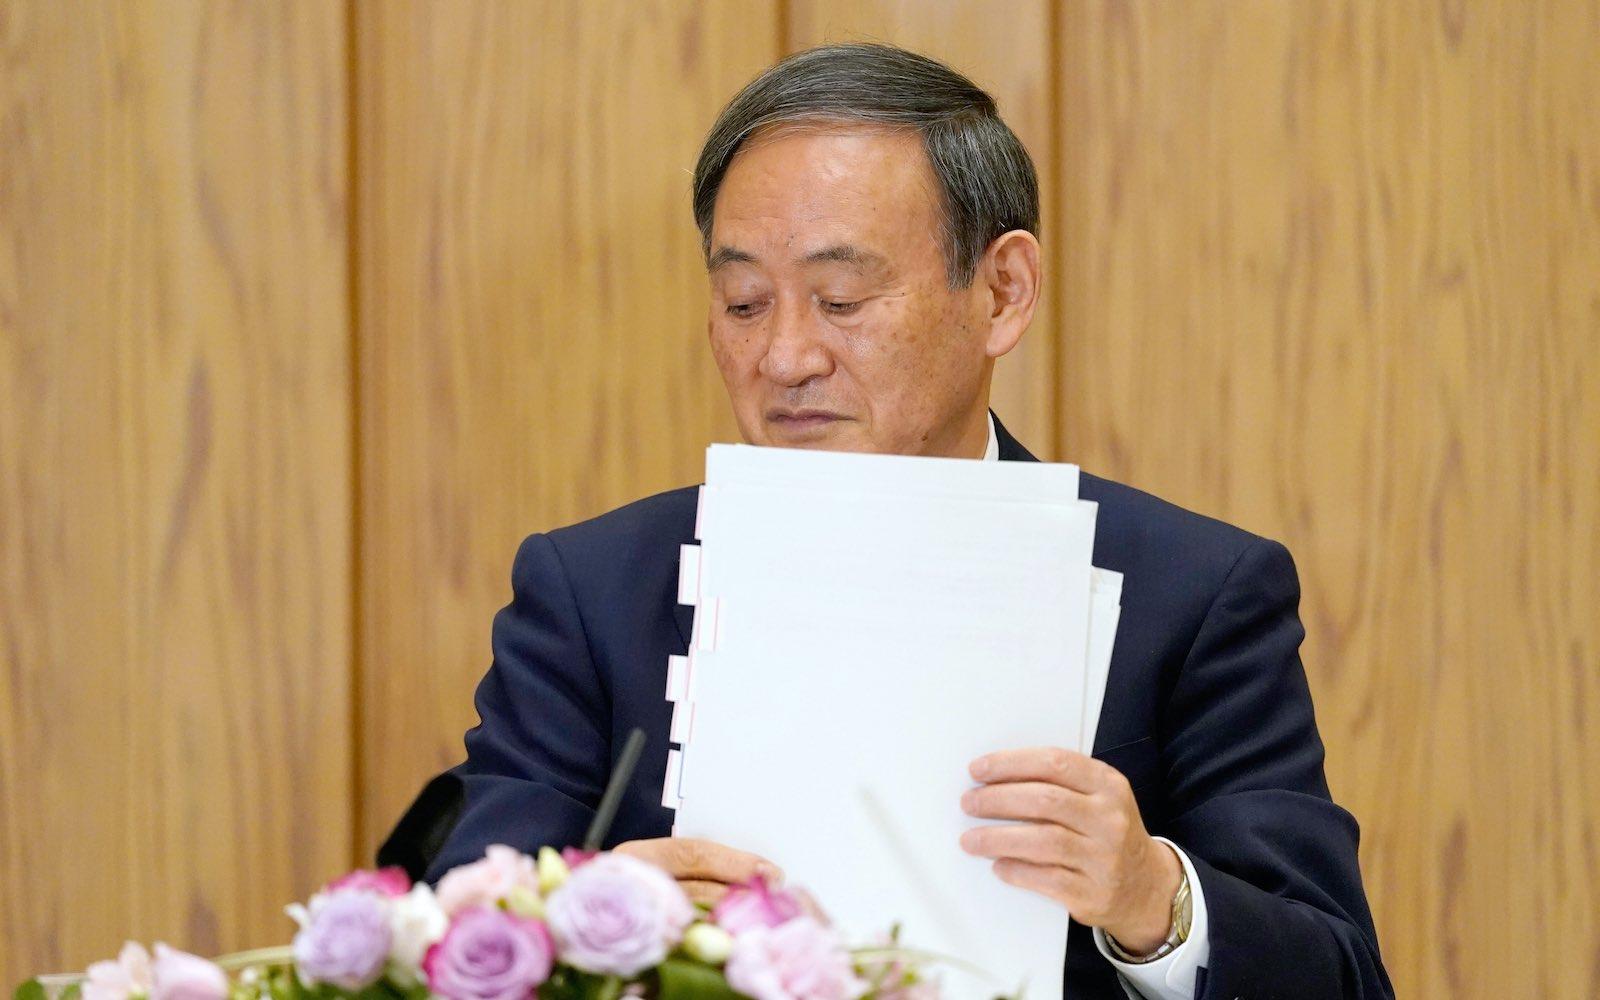 Japanese Prime Minister Yoshihide Suga, 9 October 2020 in Tokyo (The Asahi Shimbun via Getty Images)